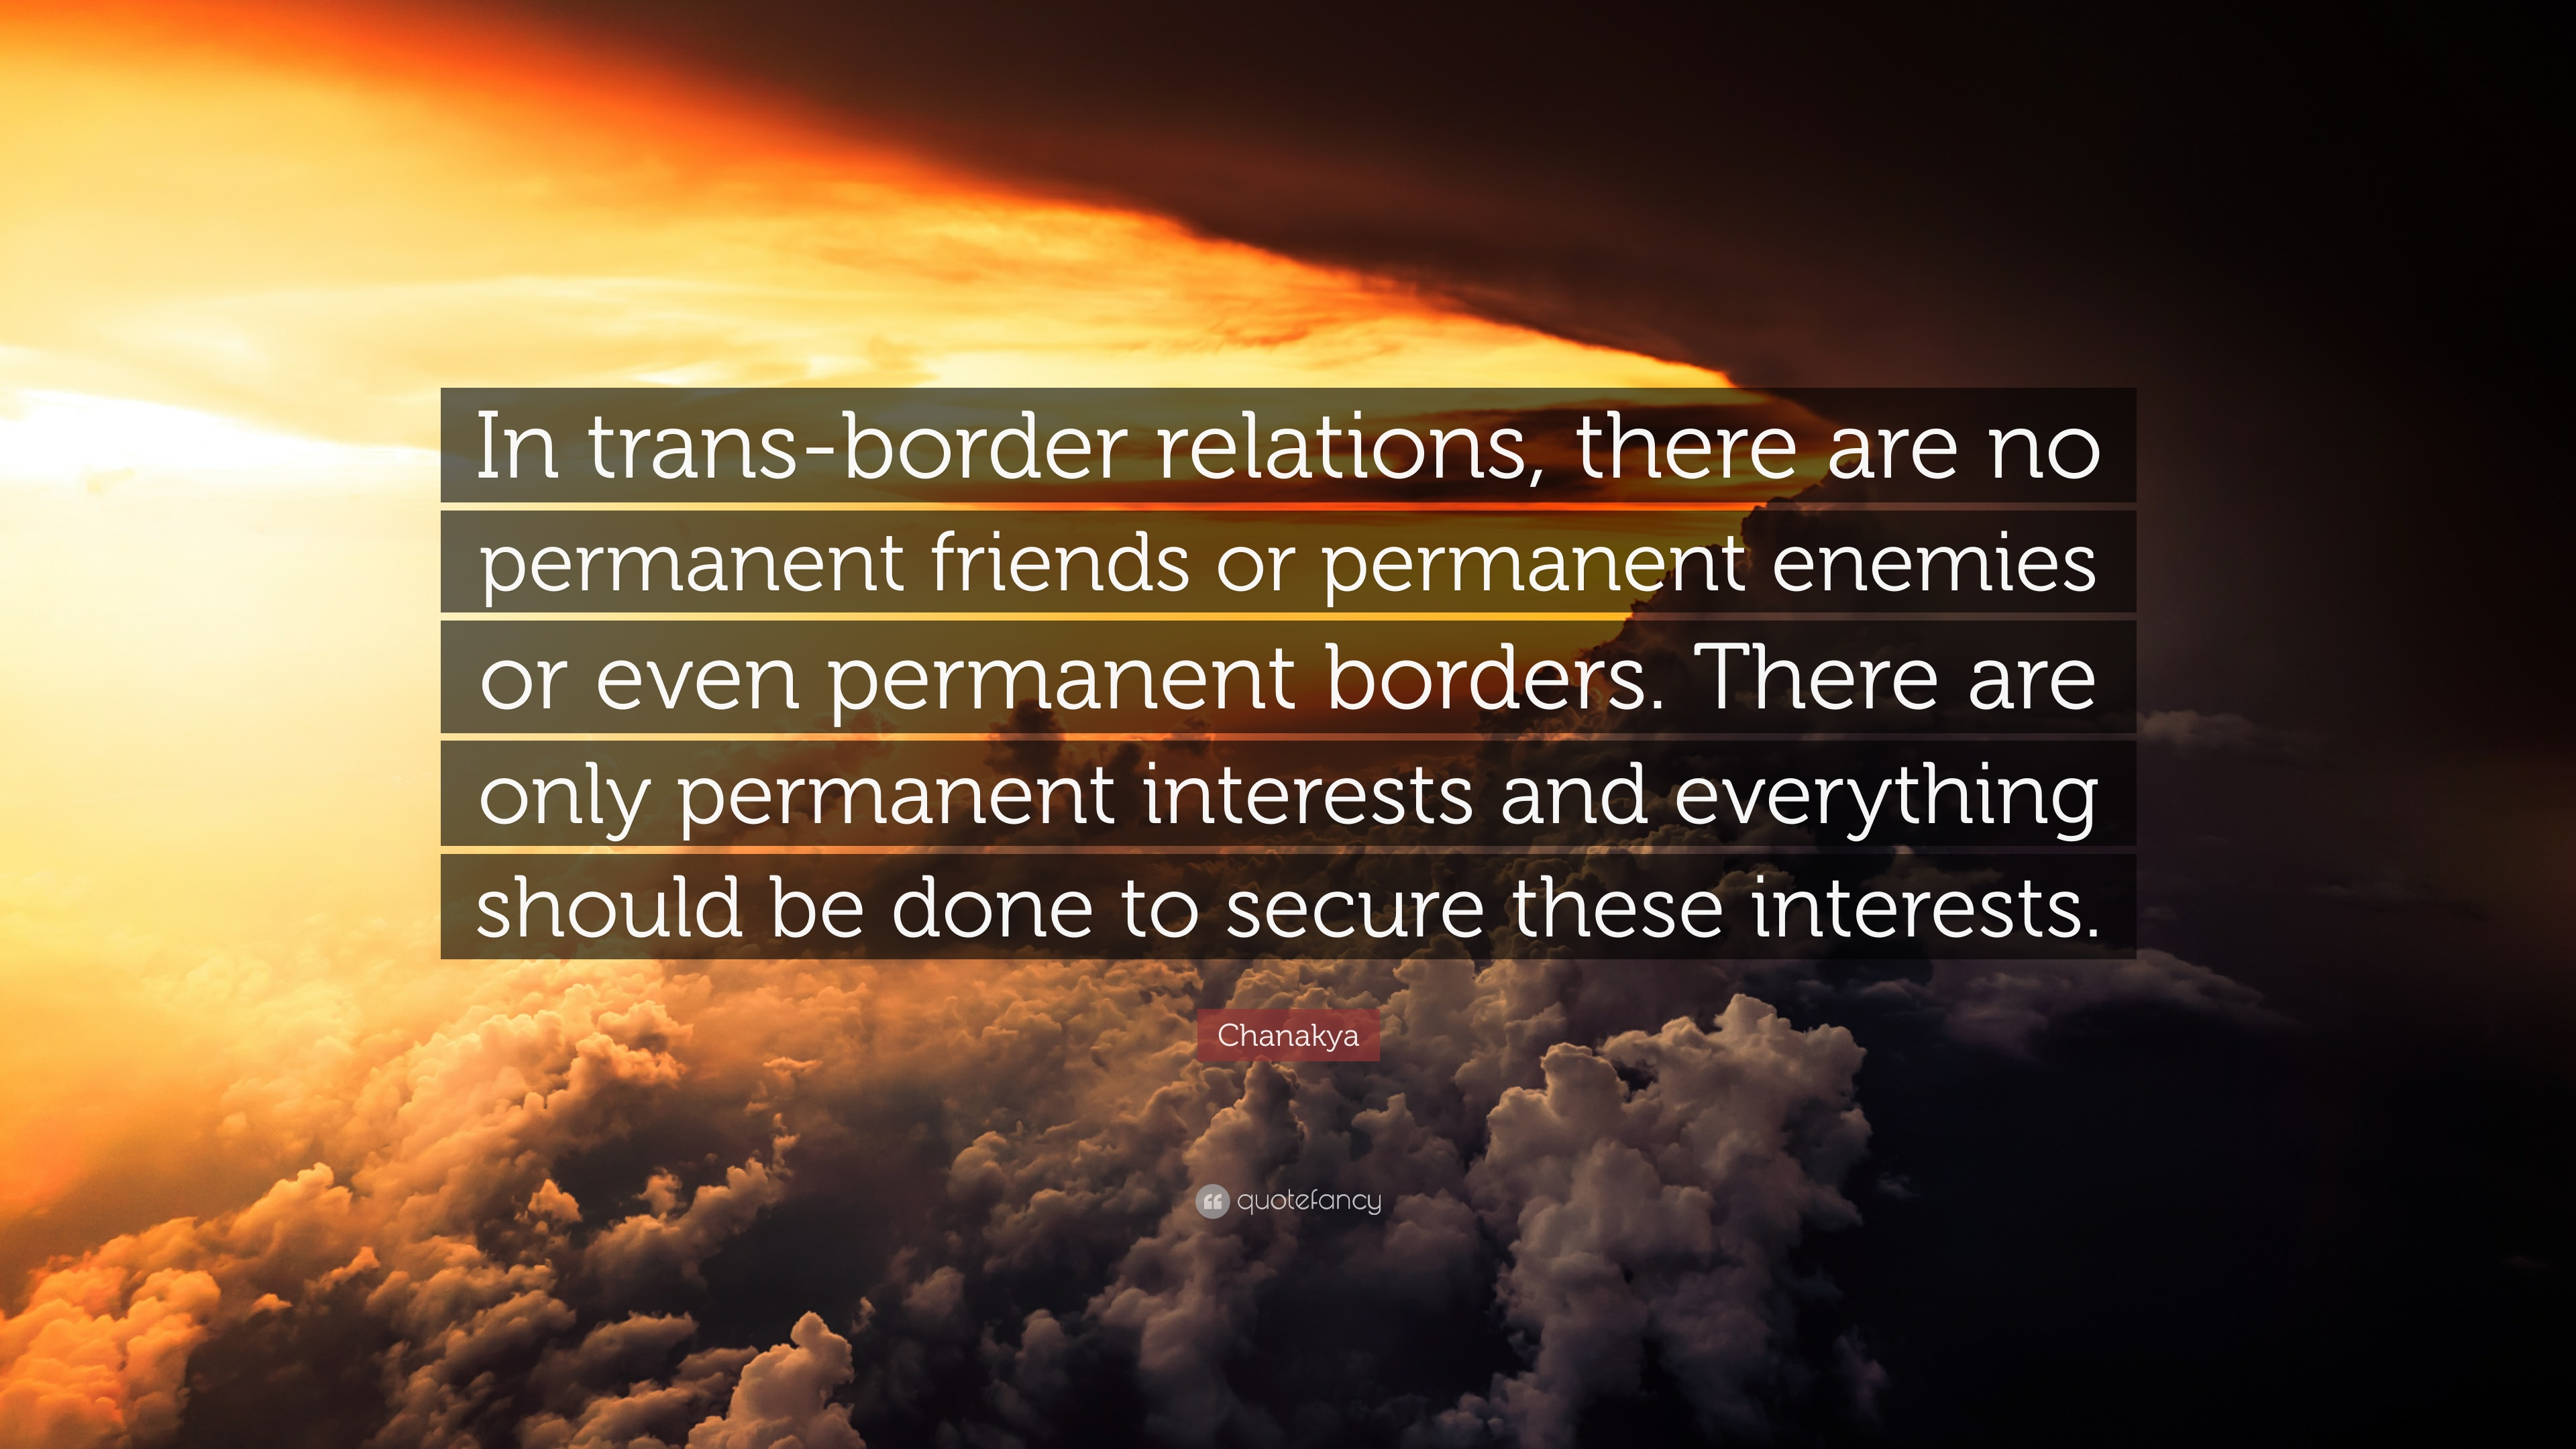 chanakya quote   u201cin trans